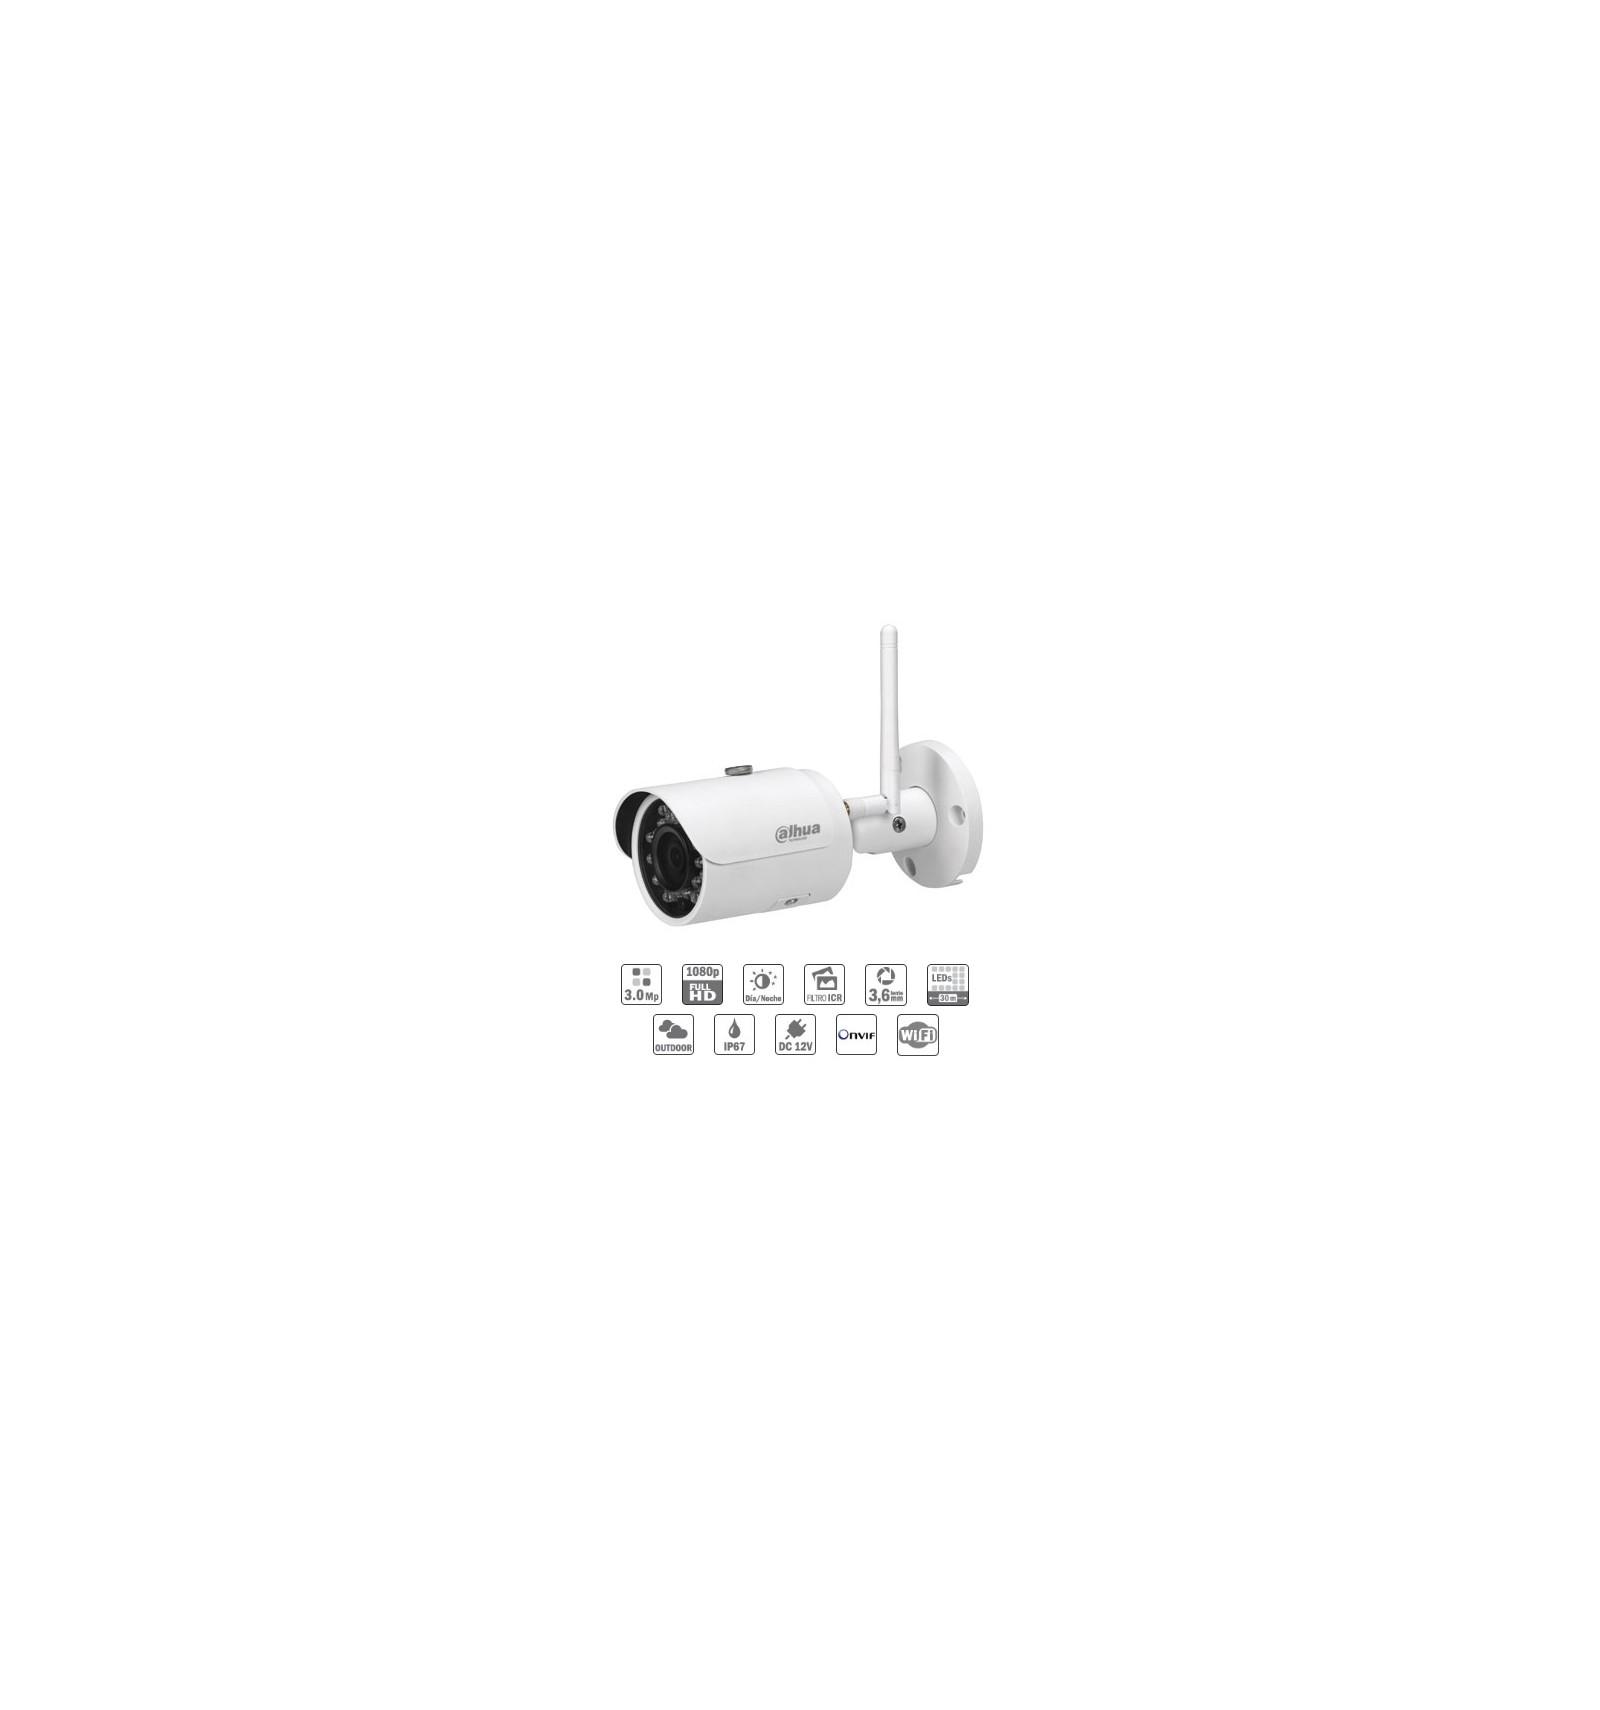 Camara de vigilancia ip tubular exterior wifi y - Camara de vigilancia ip wifi ...